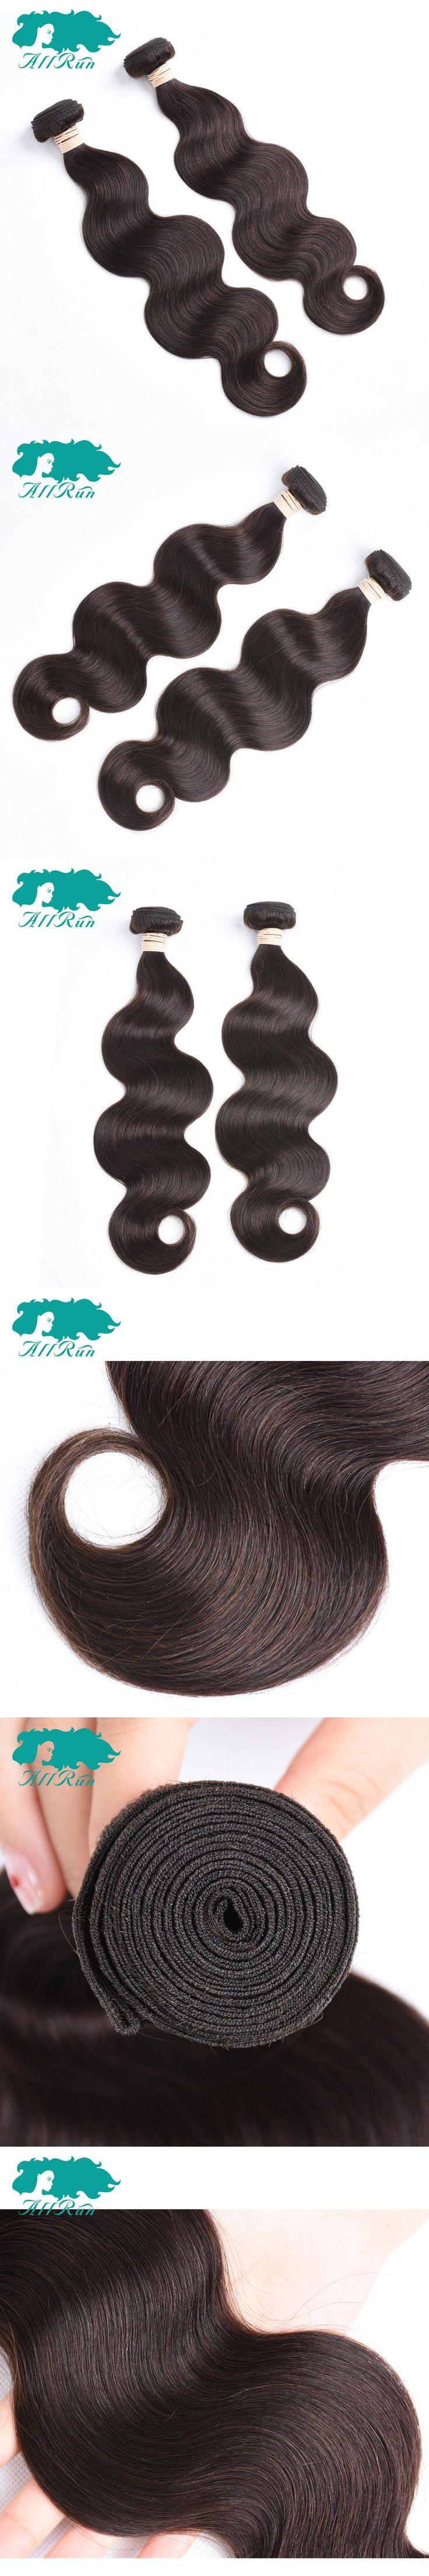 Allrun Hair Pre-colored Body Wave #2 Dark Brown Malaysian Hair Bundles Tangle  Free Malaysian Body Wave 2pcs/lot Free Shipping